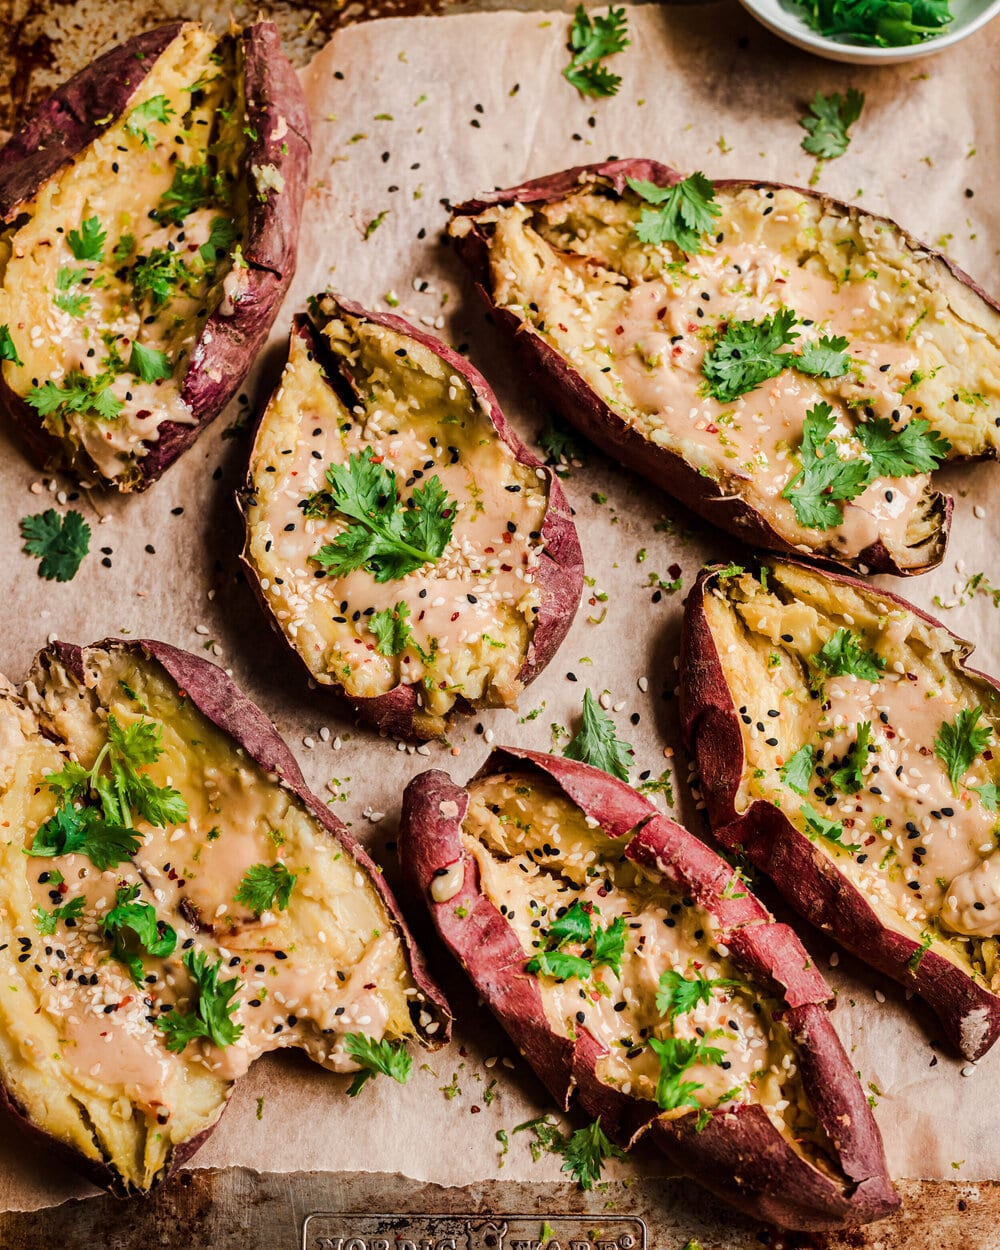 _miso+butter+sweet+potatoes+-+flatlay+angle+(1+of+1).jpg